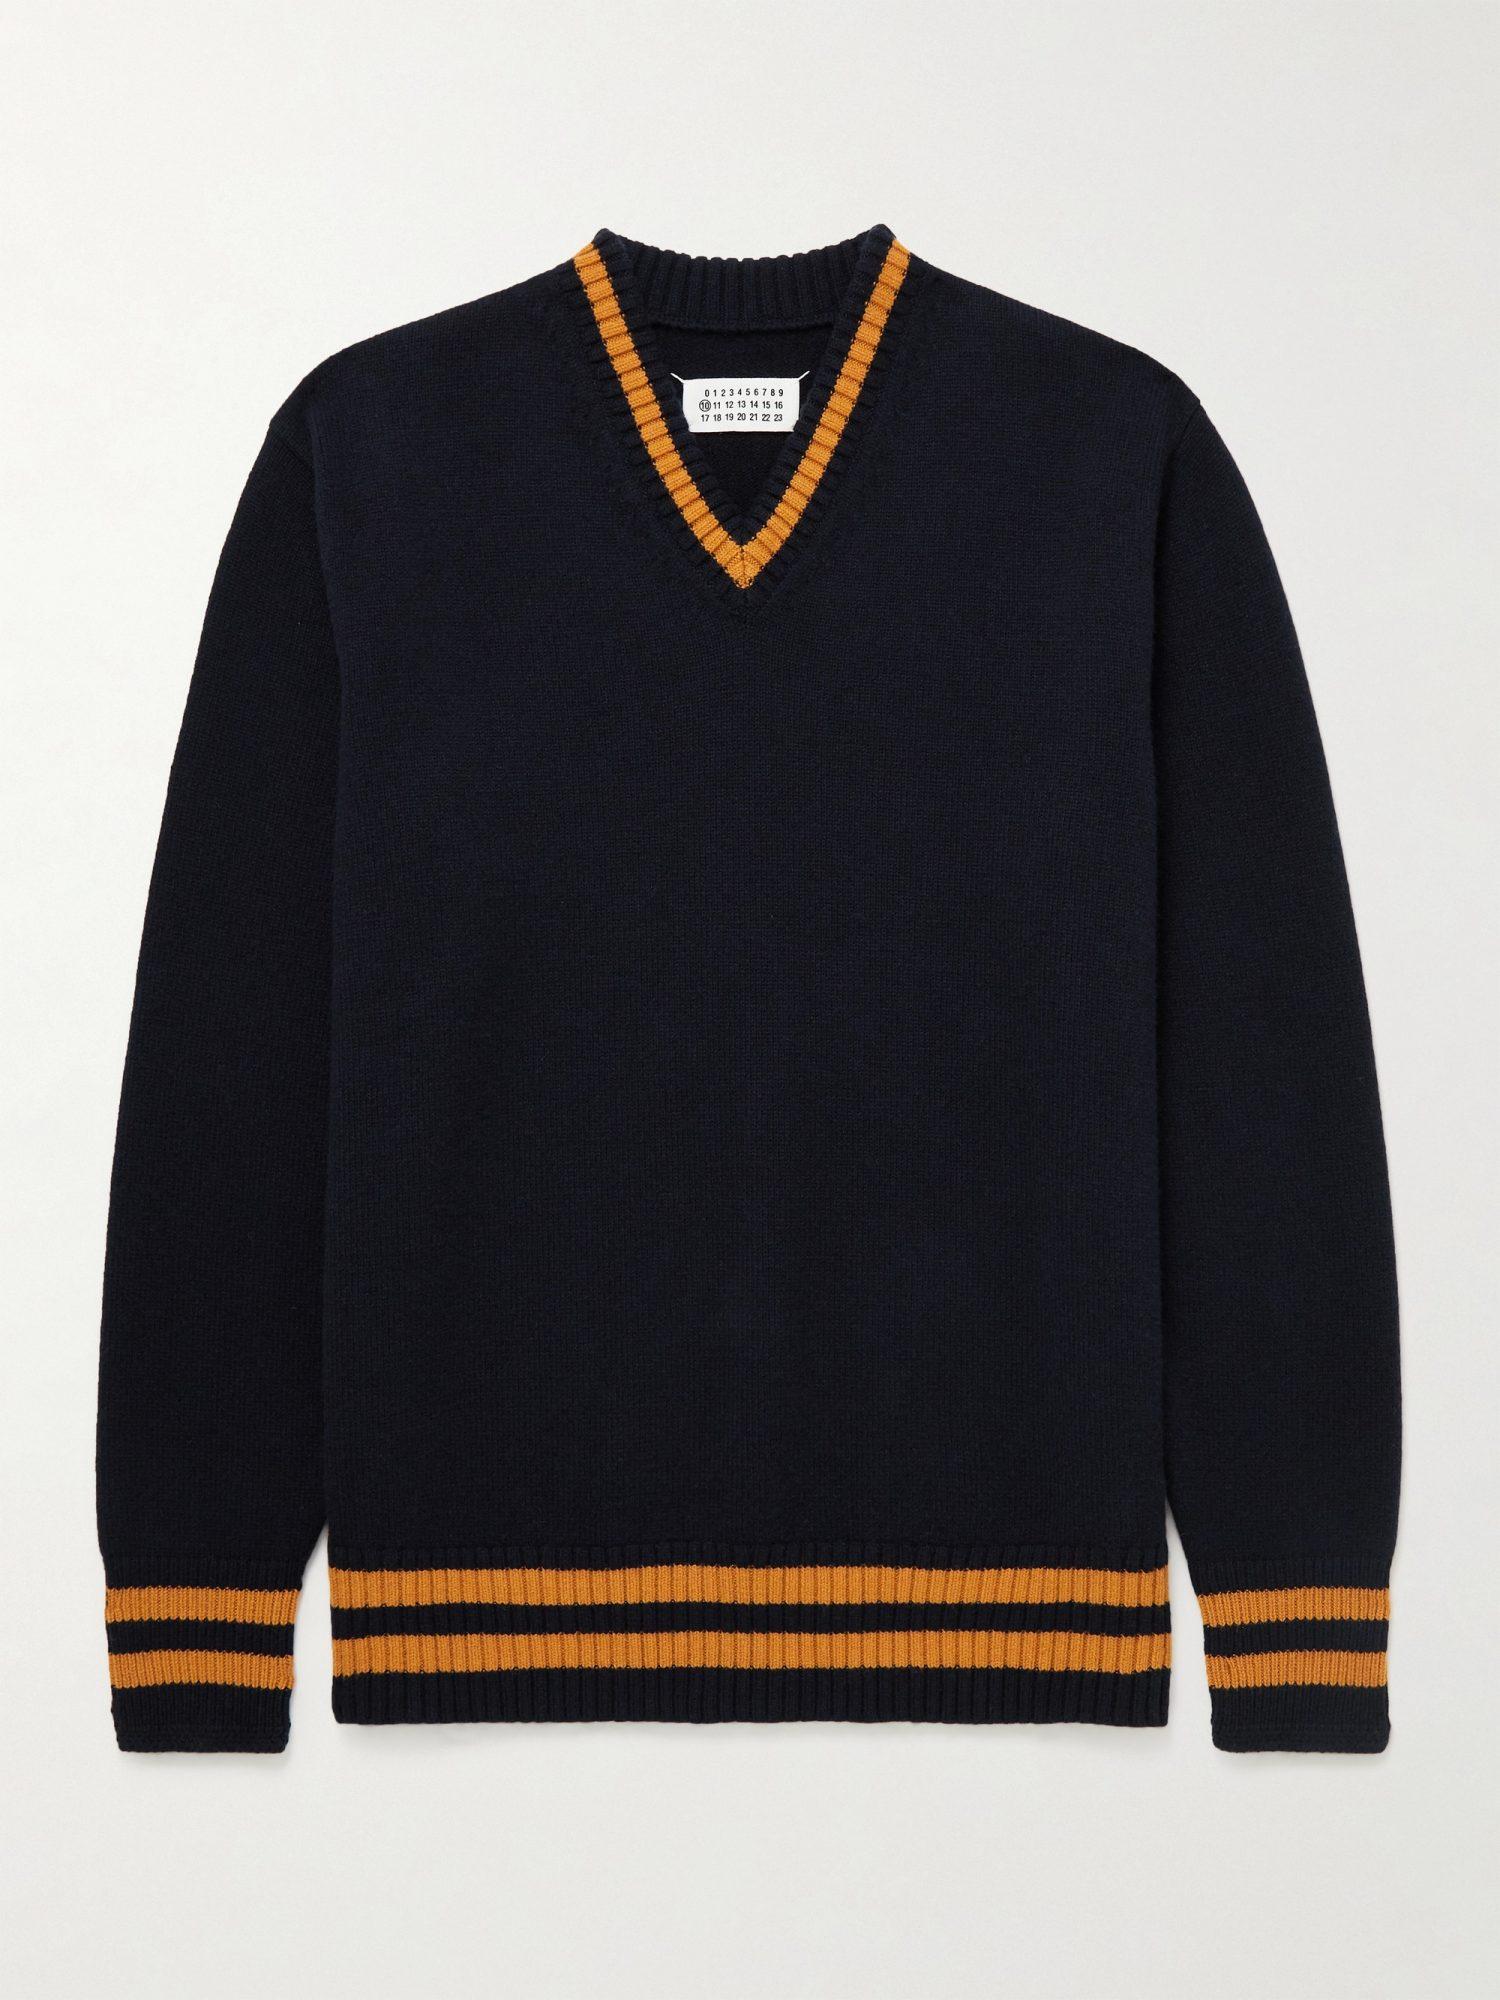 margiela v sweater